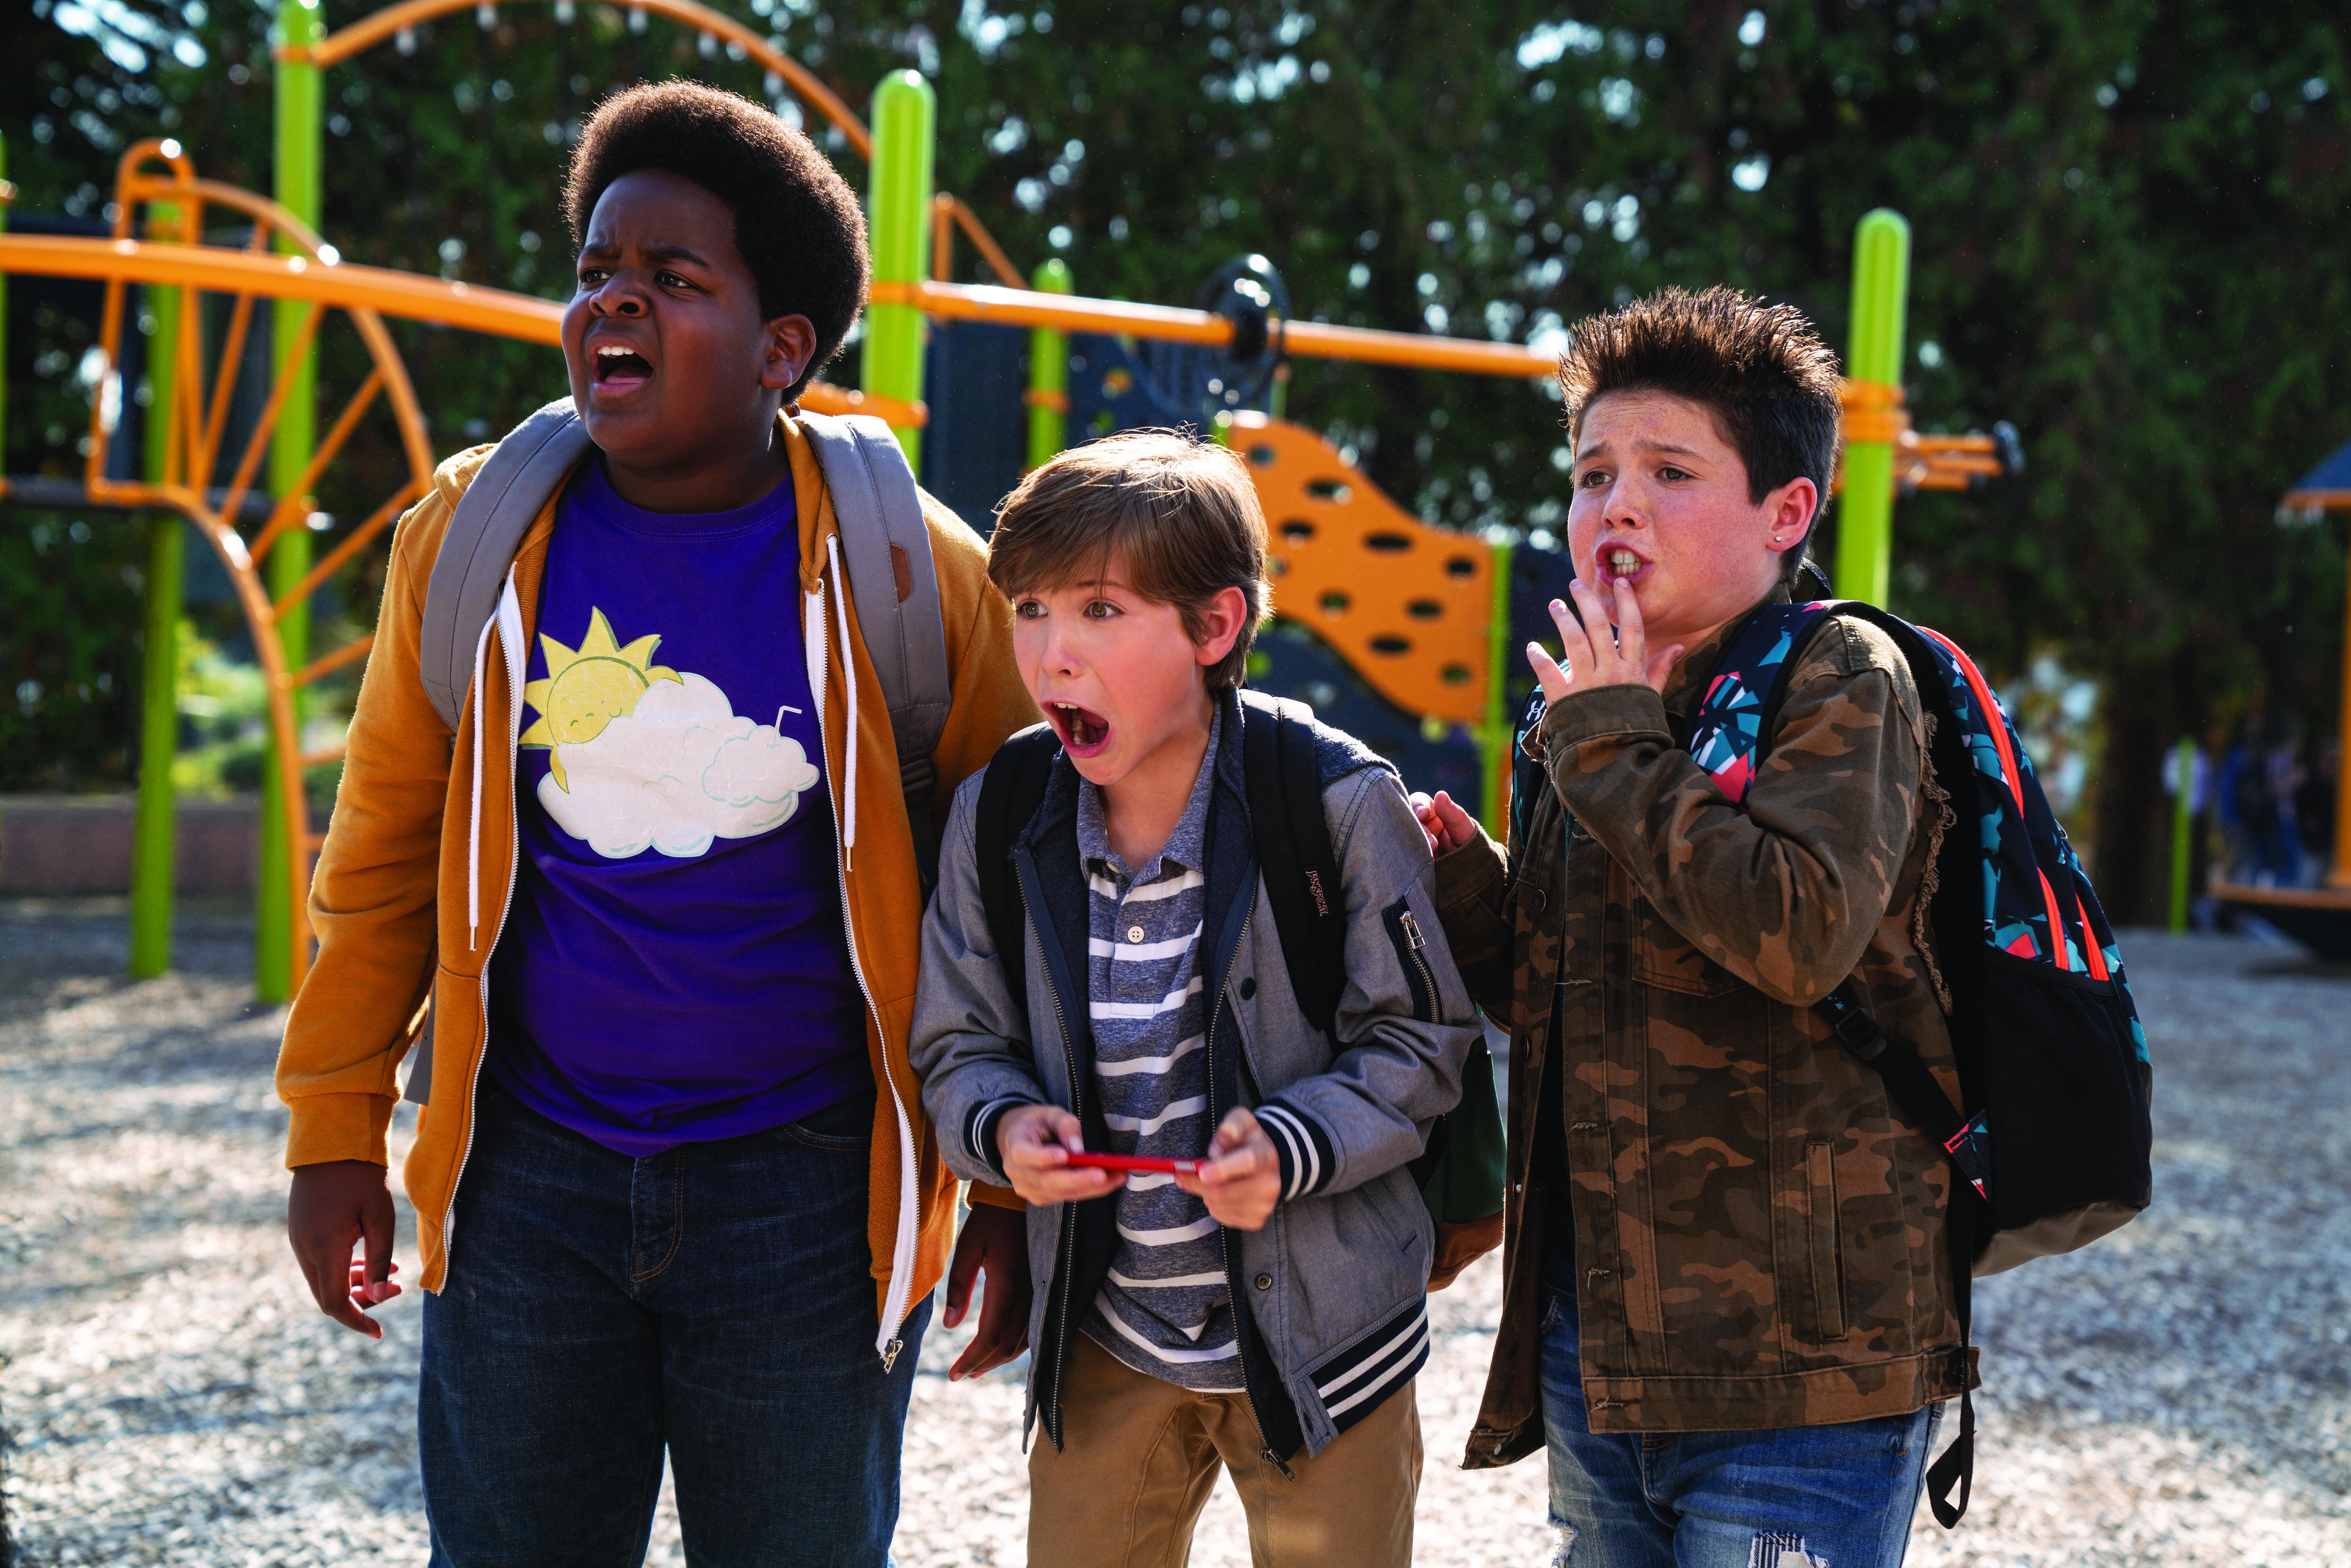 Seth Rogen & Evan Goldberg Knew 'Good Boys' Would Be Great